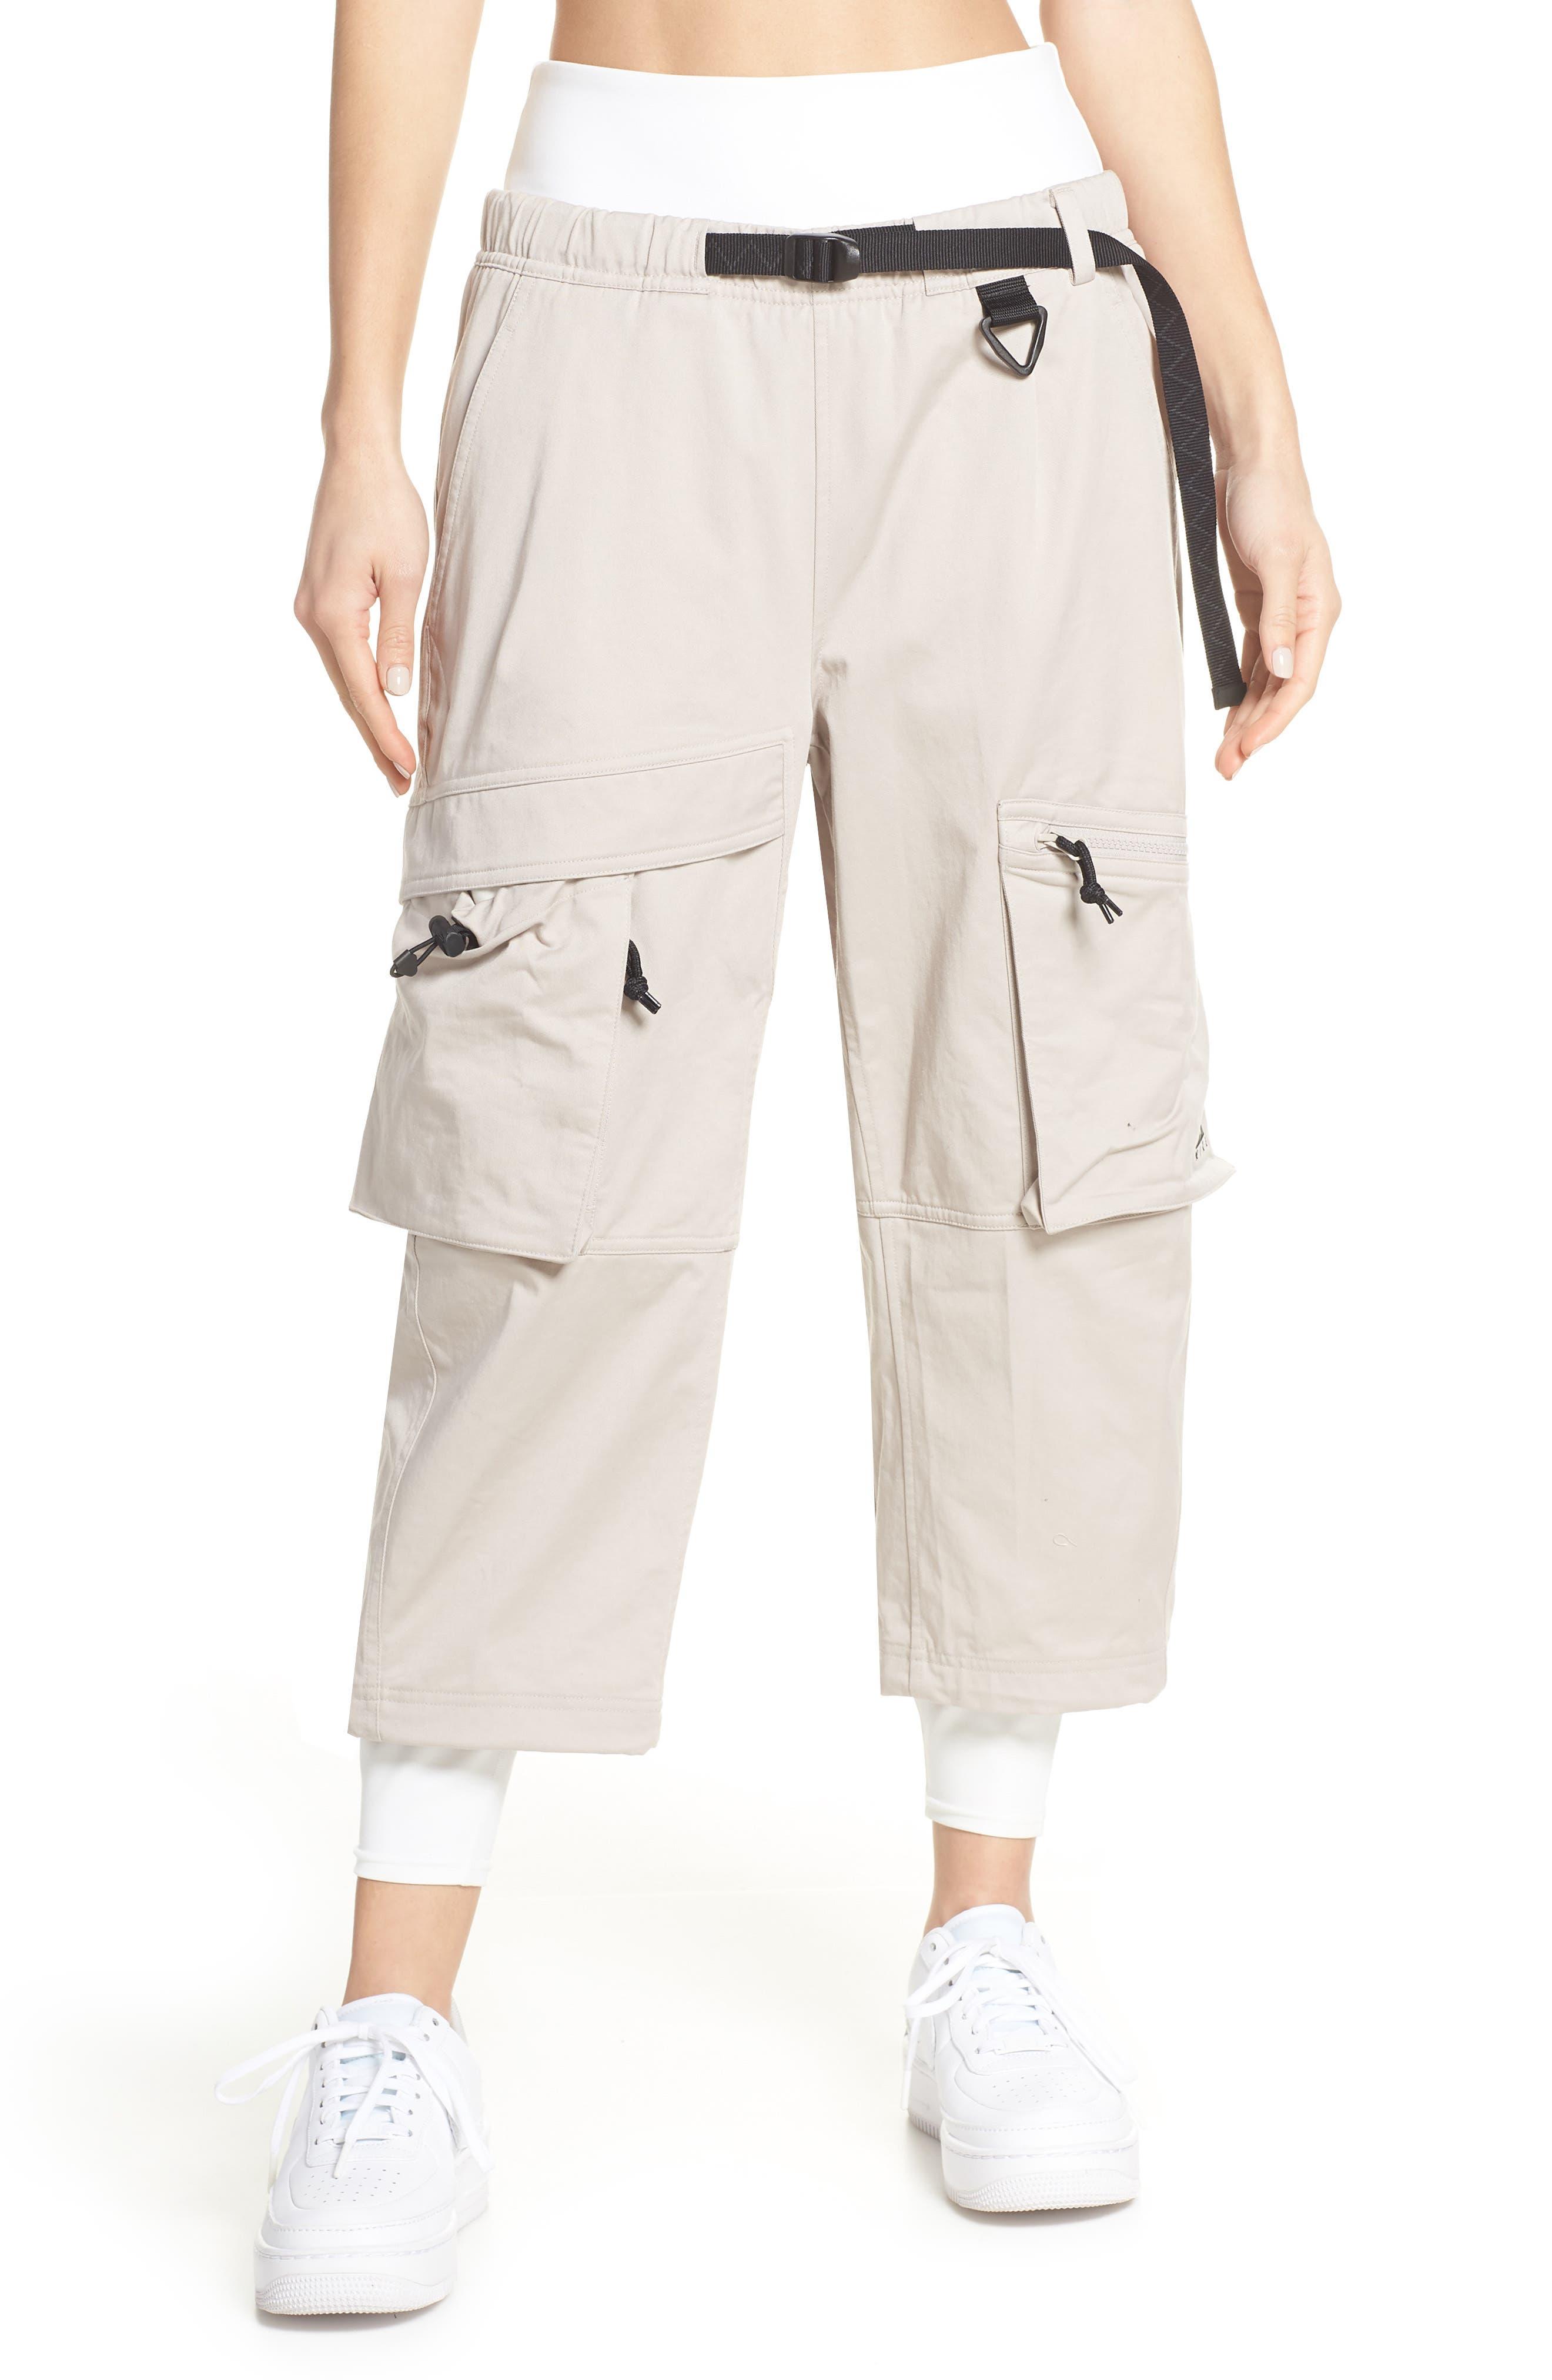 NIKE,                             ACG Women's Cargo Pants,                             Main thumbnail 1, color,                             MOON PARTICLE